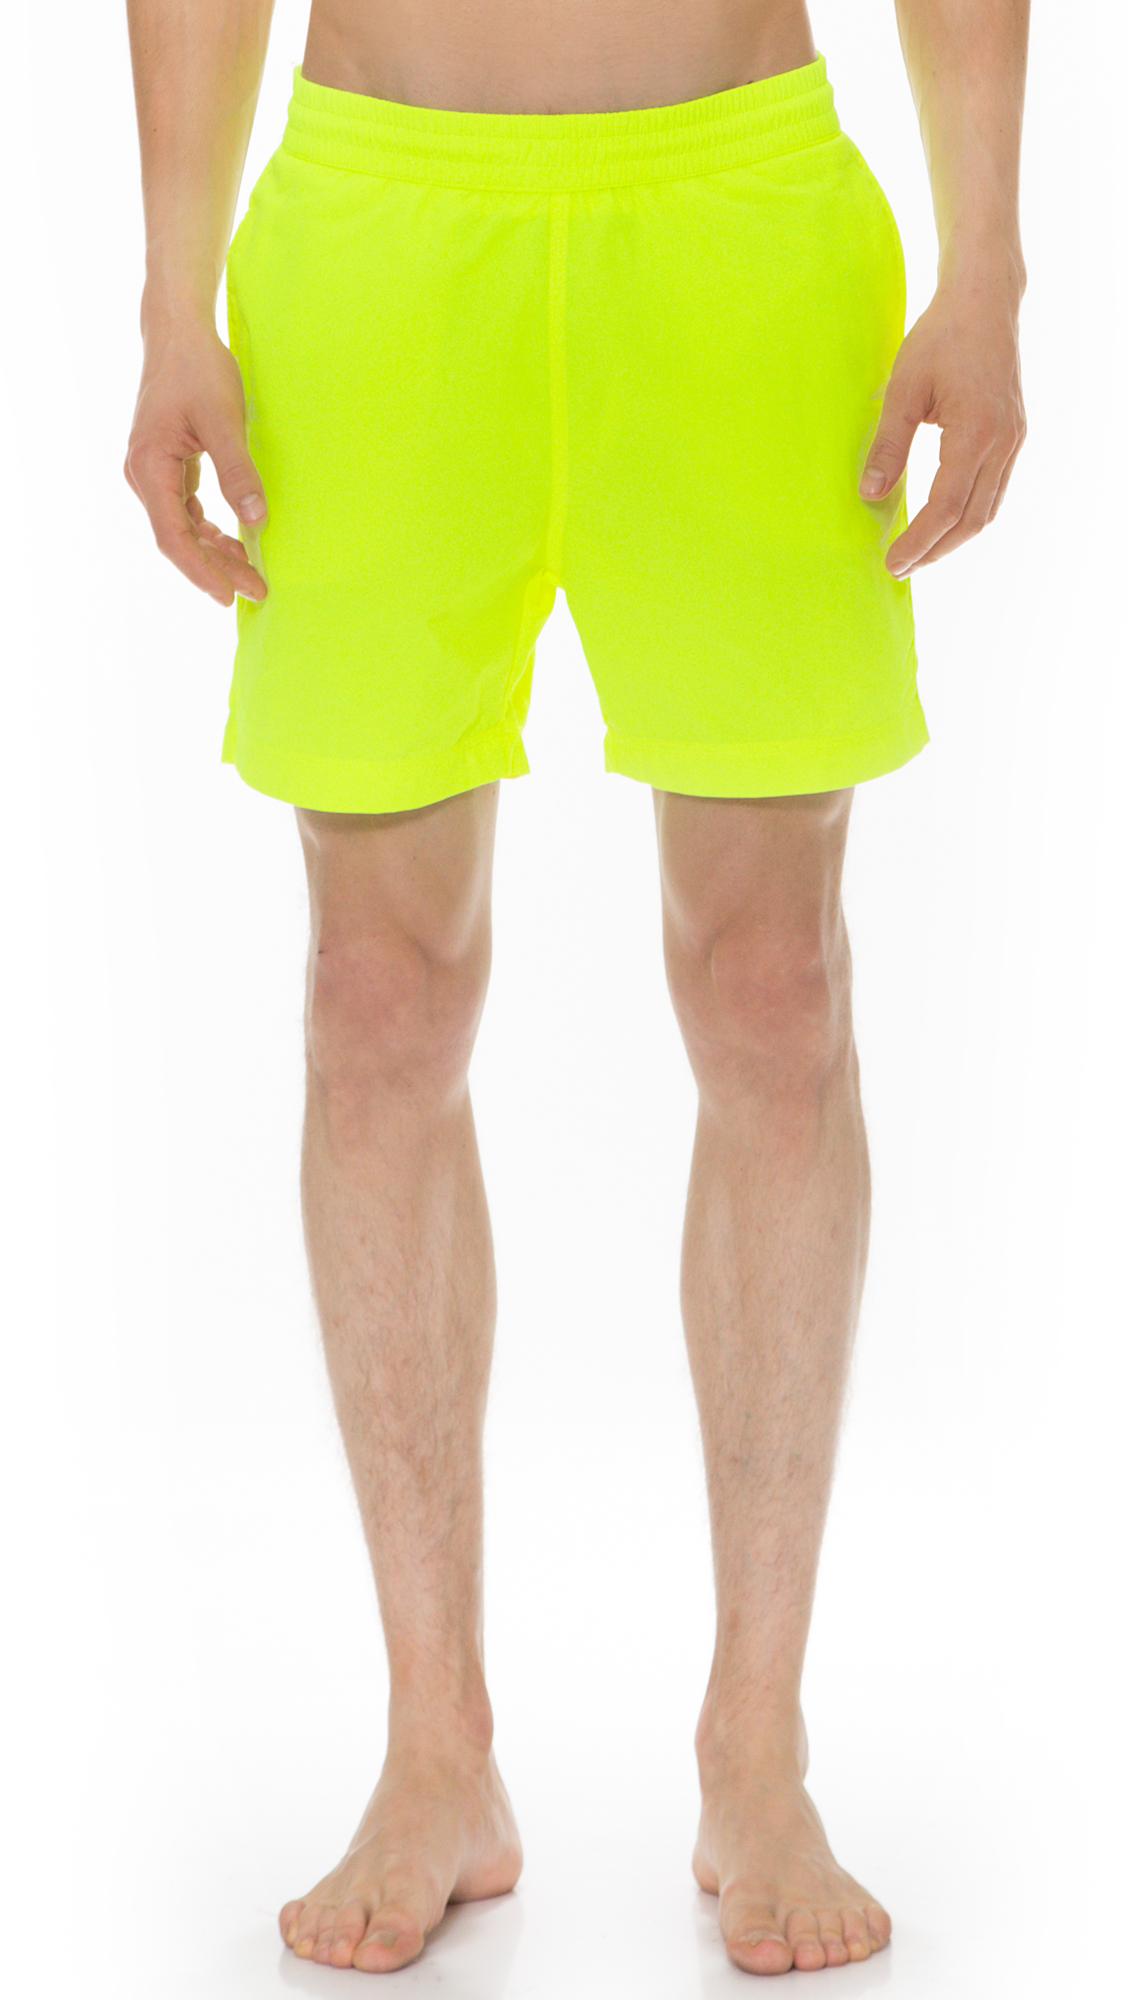 68b4ca0176 Lyst - Carhartt WIP Drift Swim Trunks in Yellow for Men